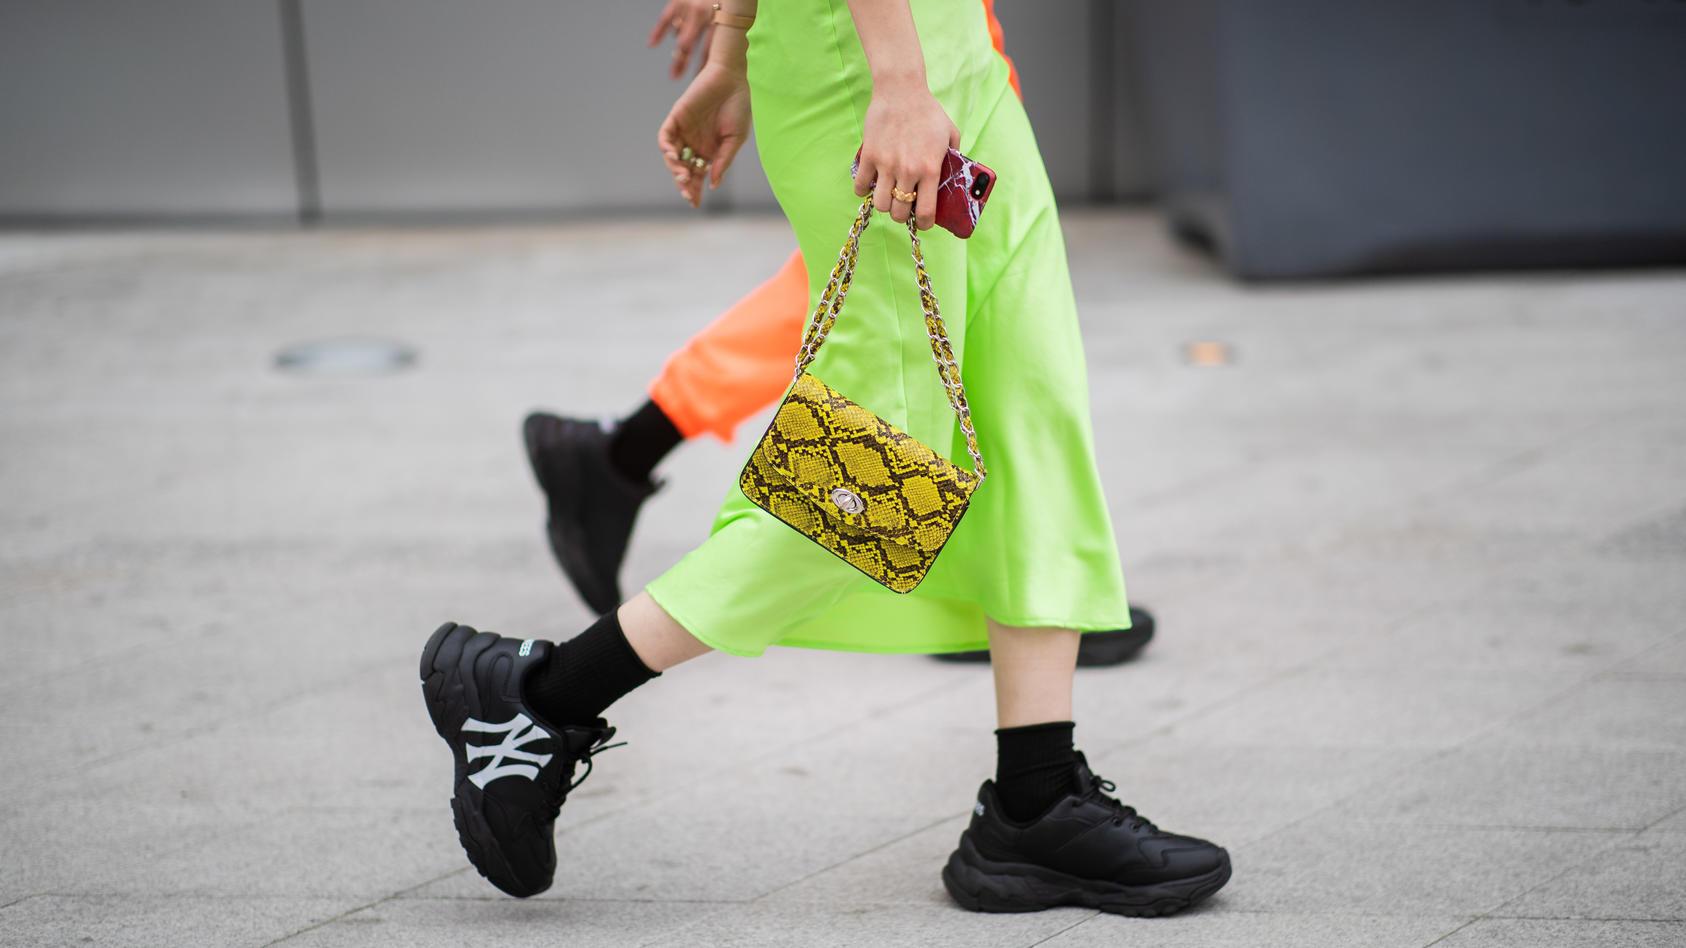 Es ist gerade DIE Lieblingsfarbe aller Influencer: Neongrün. Besonders knallgrüne Röcke lösen momentan Schnappatmung aus.